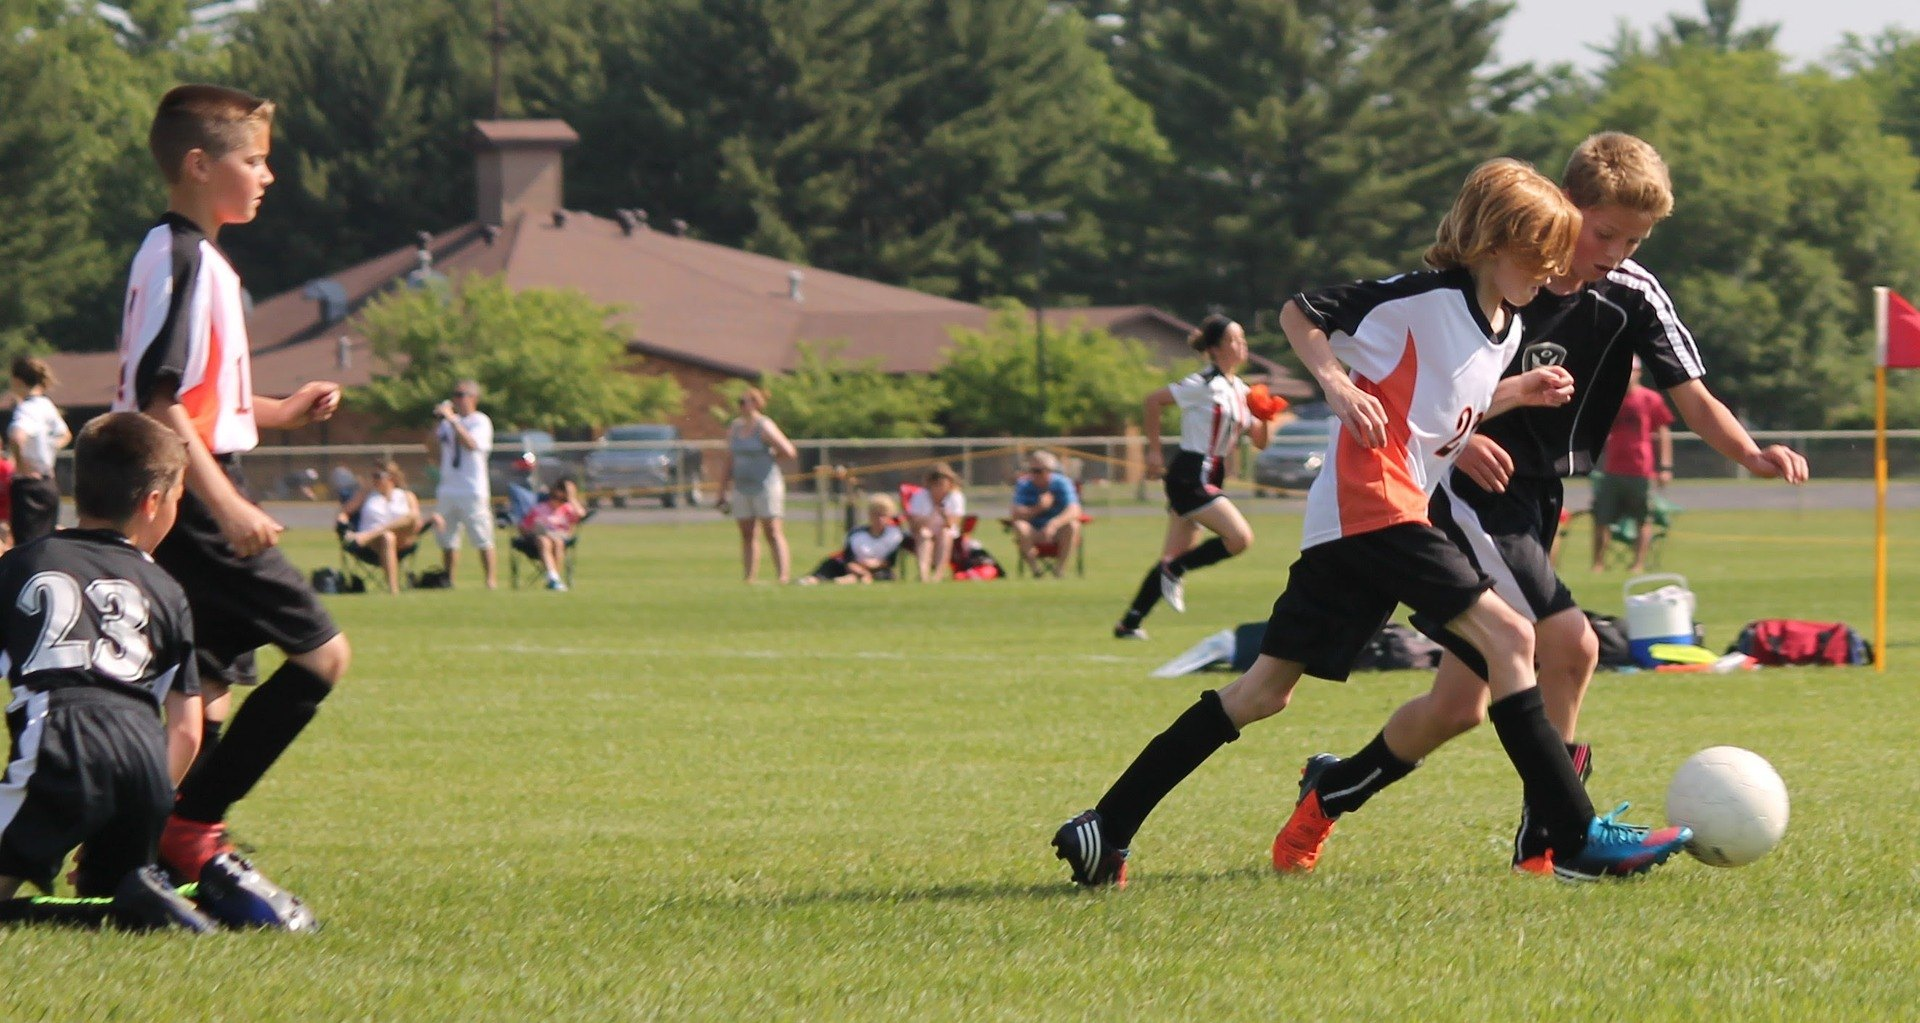 kids, playing, soccer